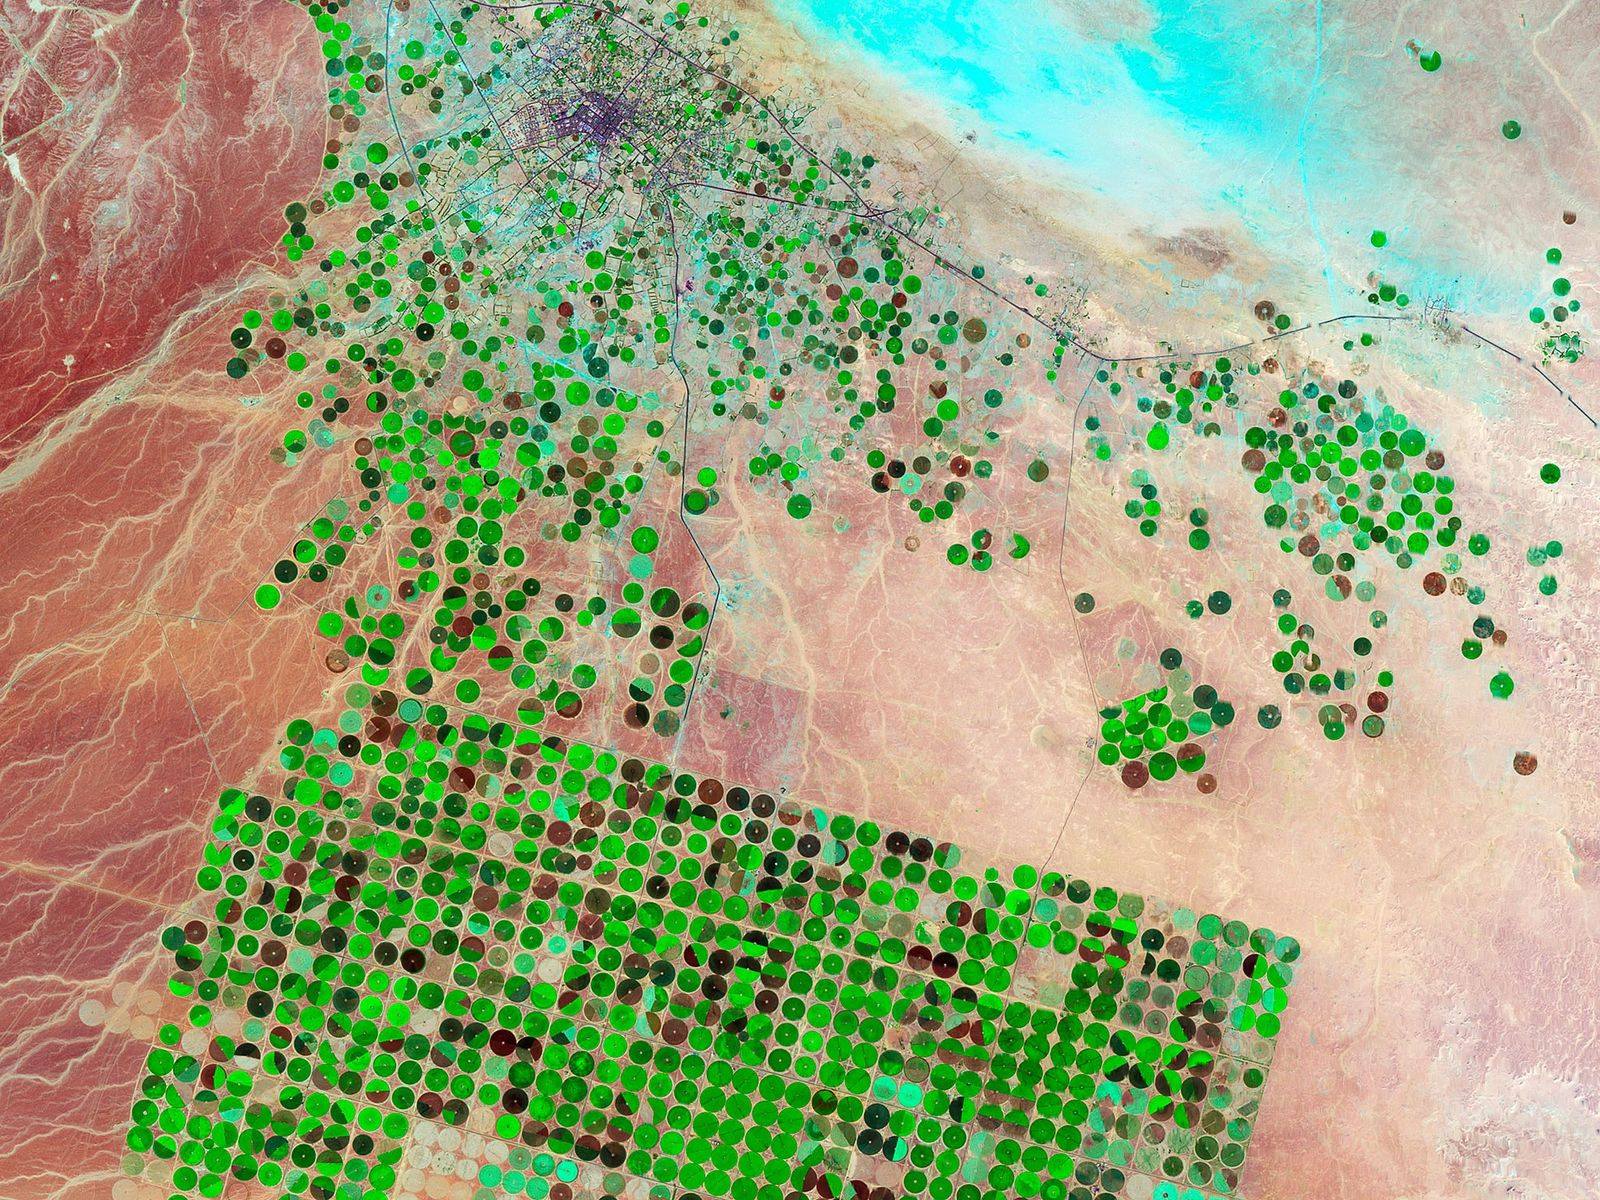 Bewässerte Getreidekreise, Saudi-Arabien